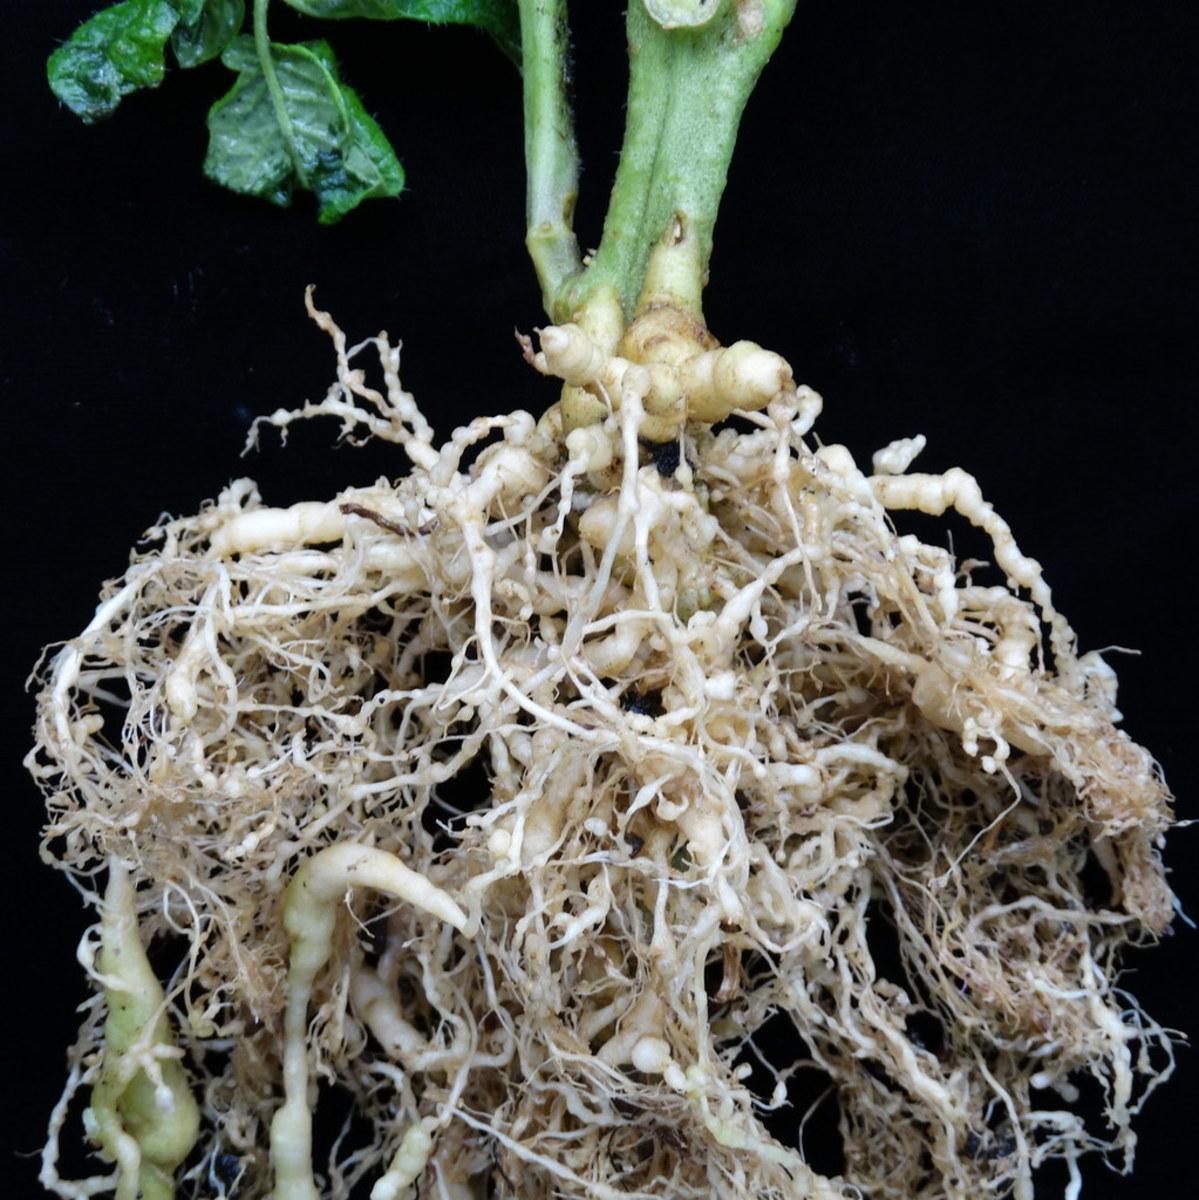 Tomato plant roots damaged by nematodes.